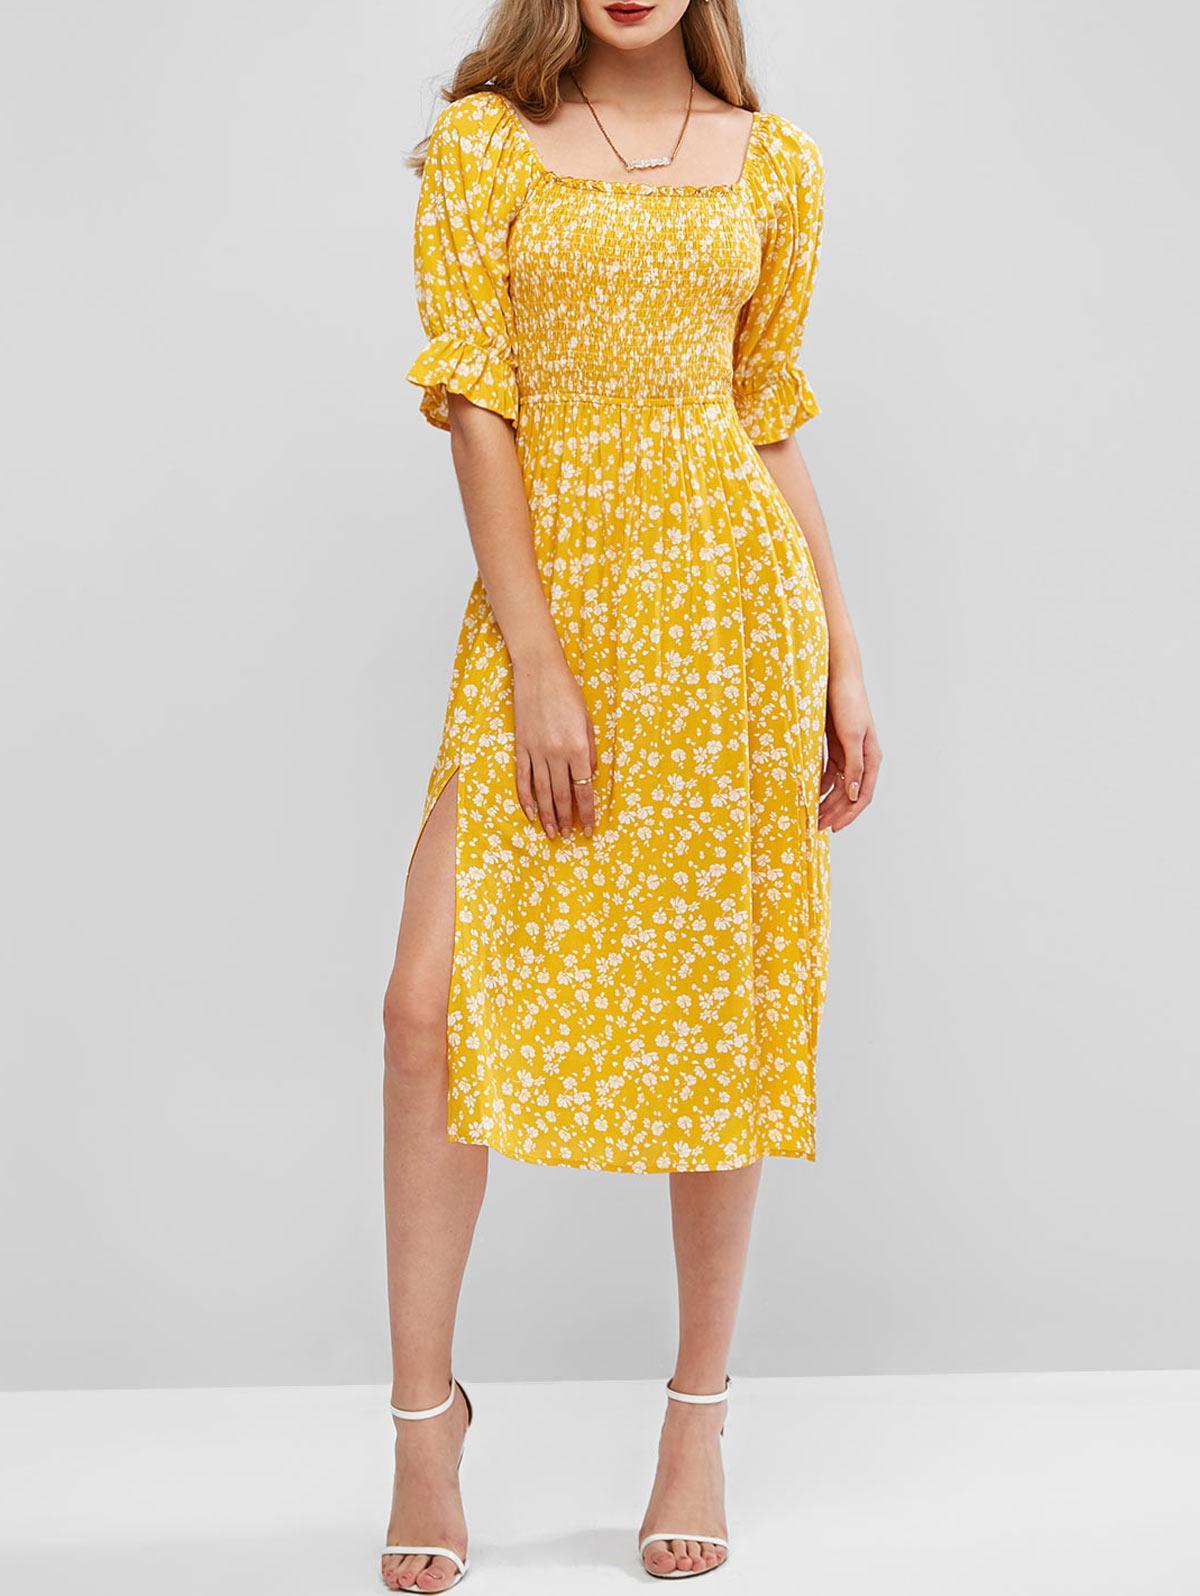 ZAFUL Floral Square Neck Puff Sleeve Smocked Slit Dress